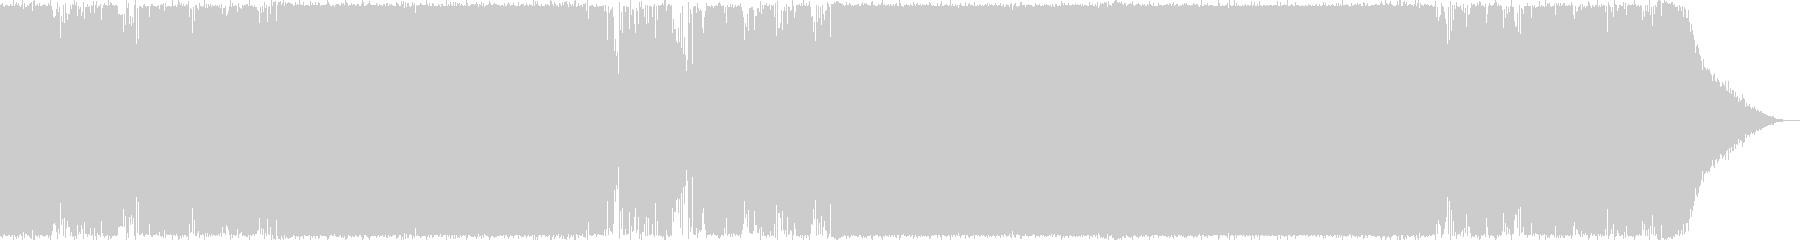 Youtube・華やかなトロピカルハウスの未再生の波形